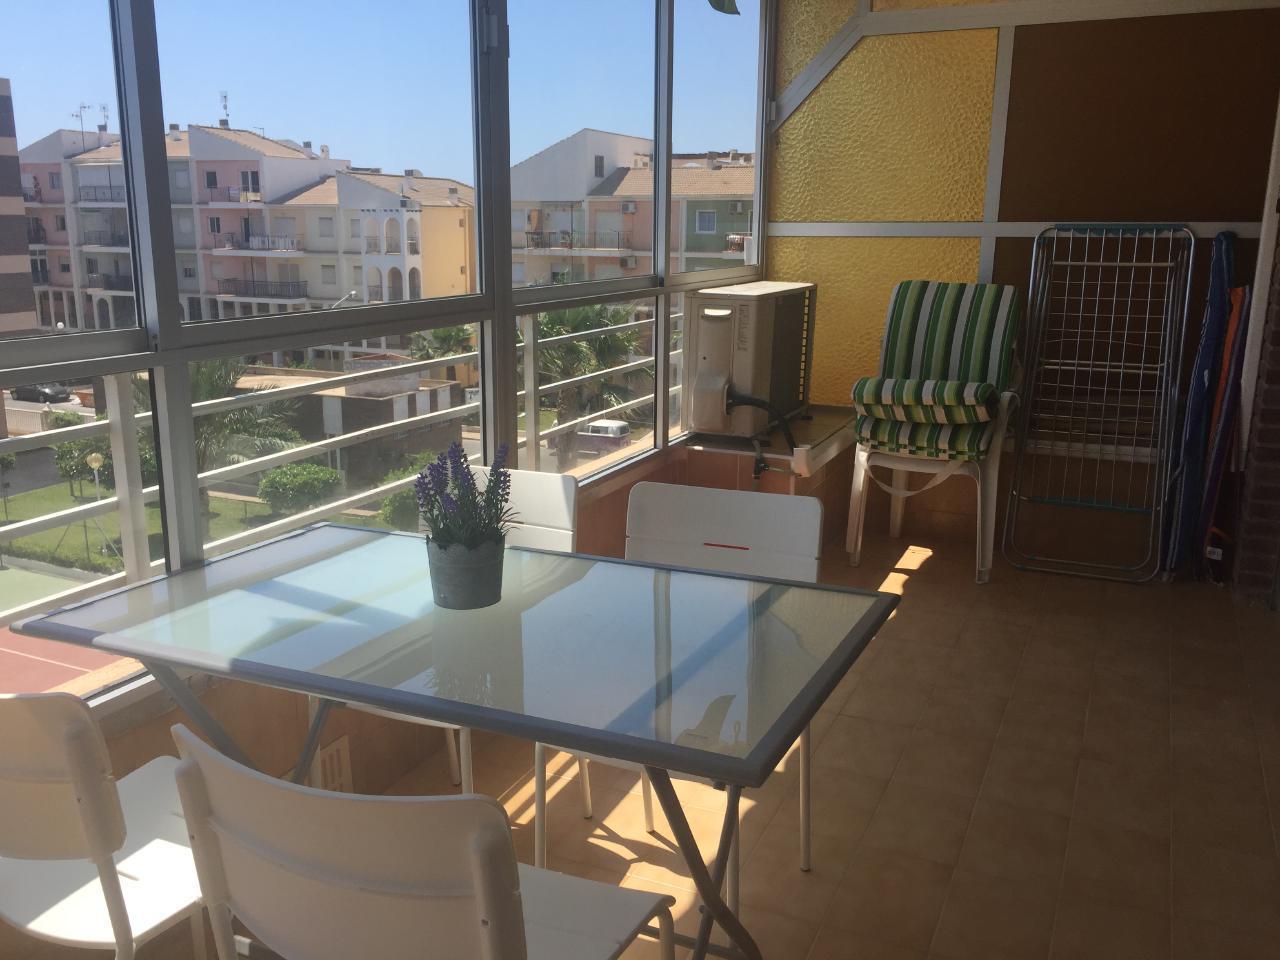 Appartement de vacances Sonnige 3.5 Zi-Wohnung am Meer (1026876), Torrevieja, Costa Blanca, Valence, Espagne, image 21